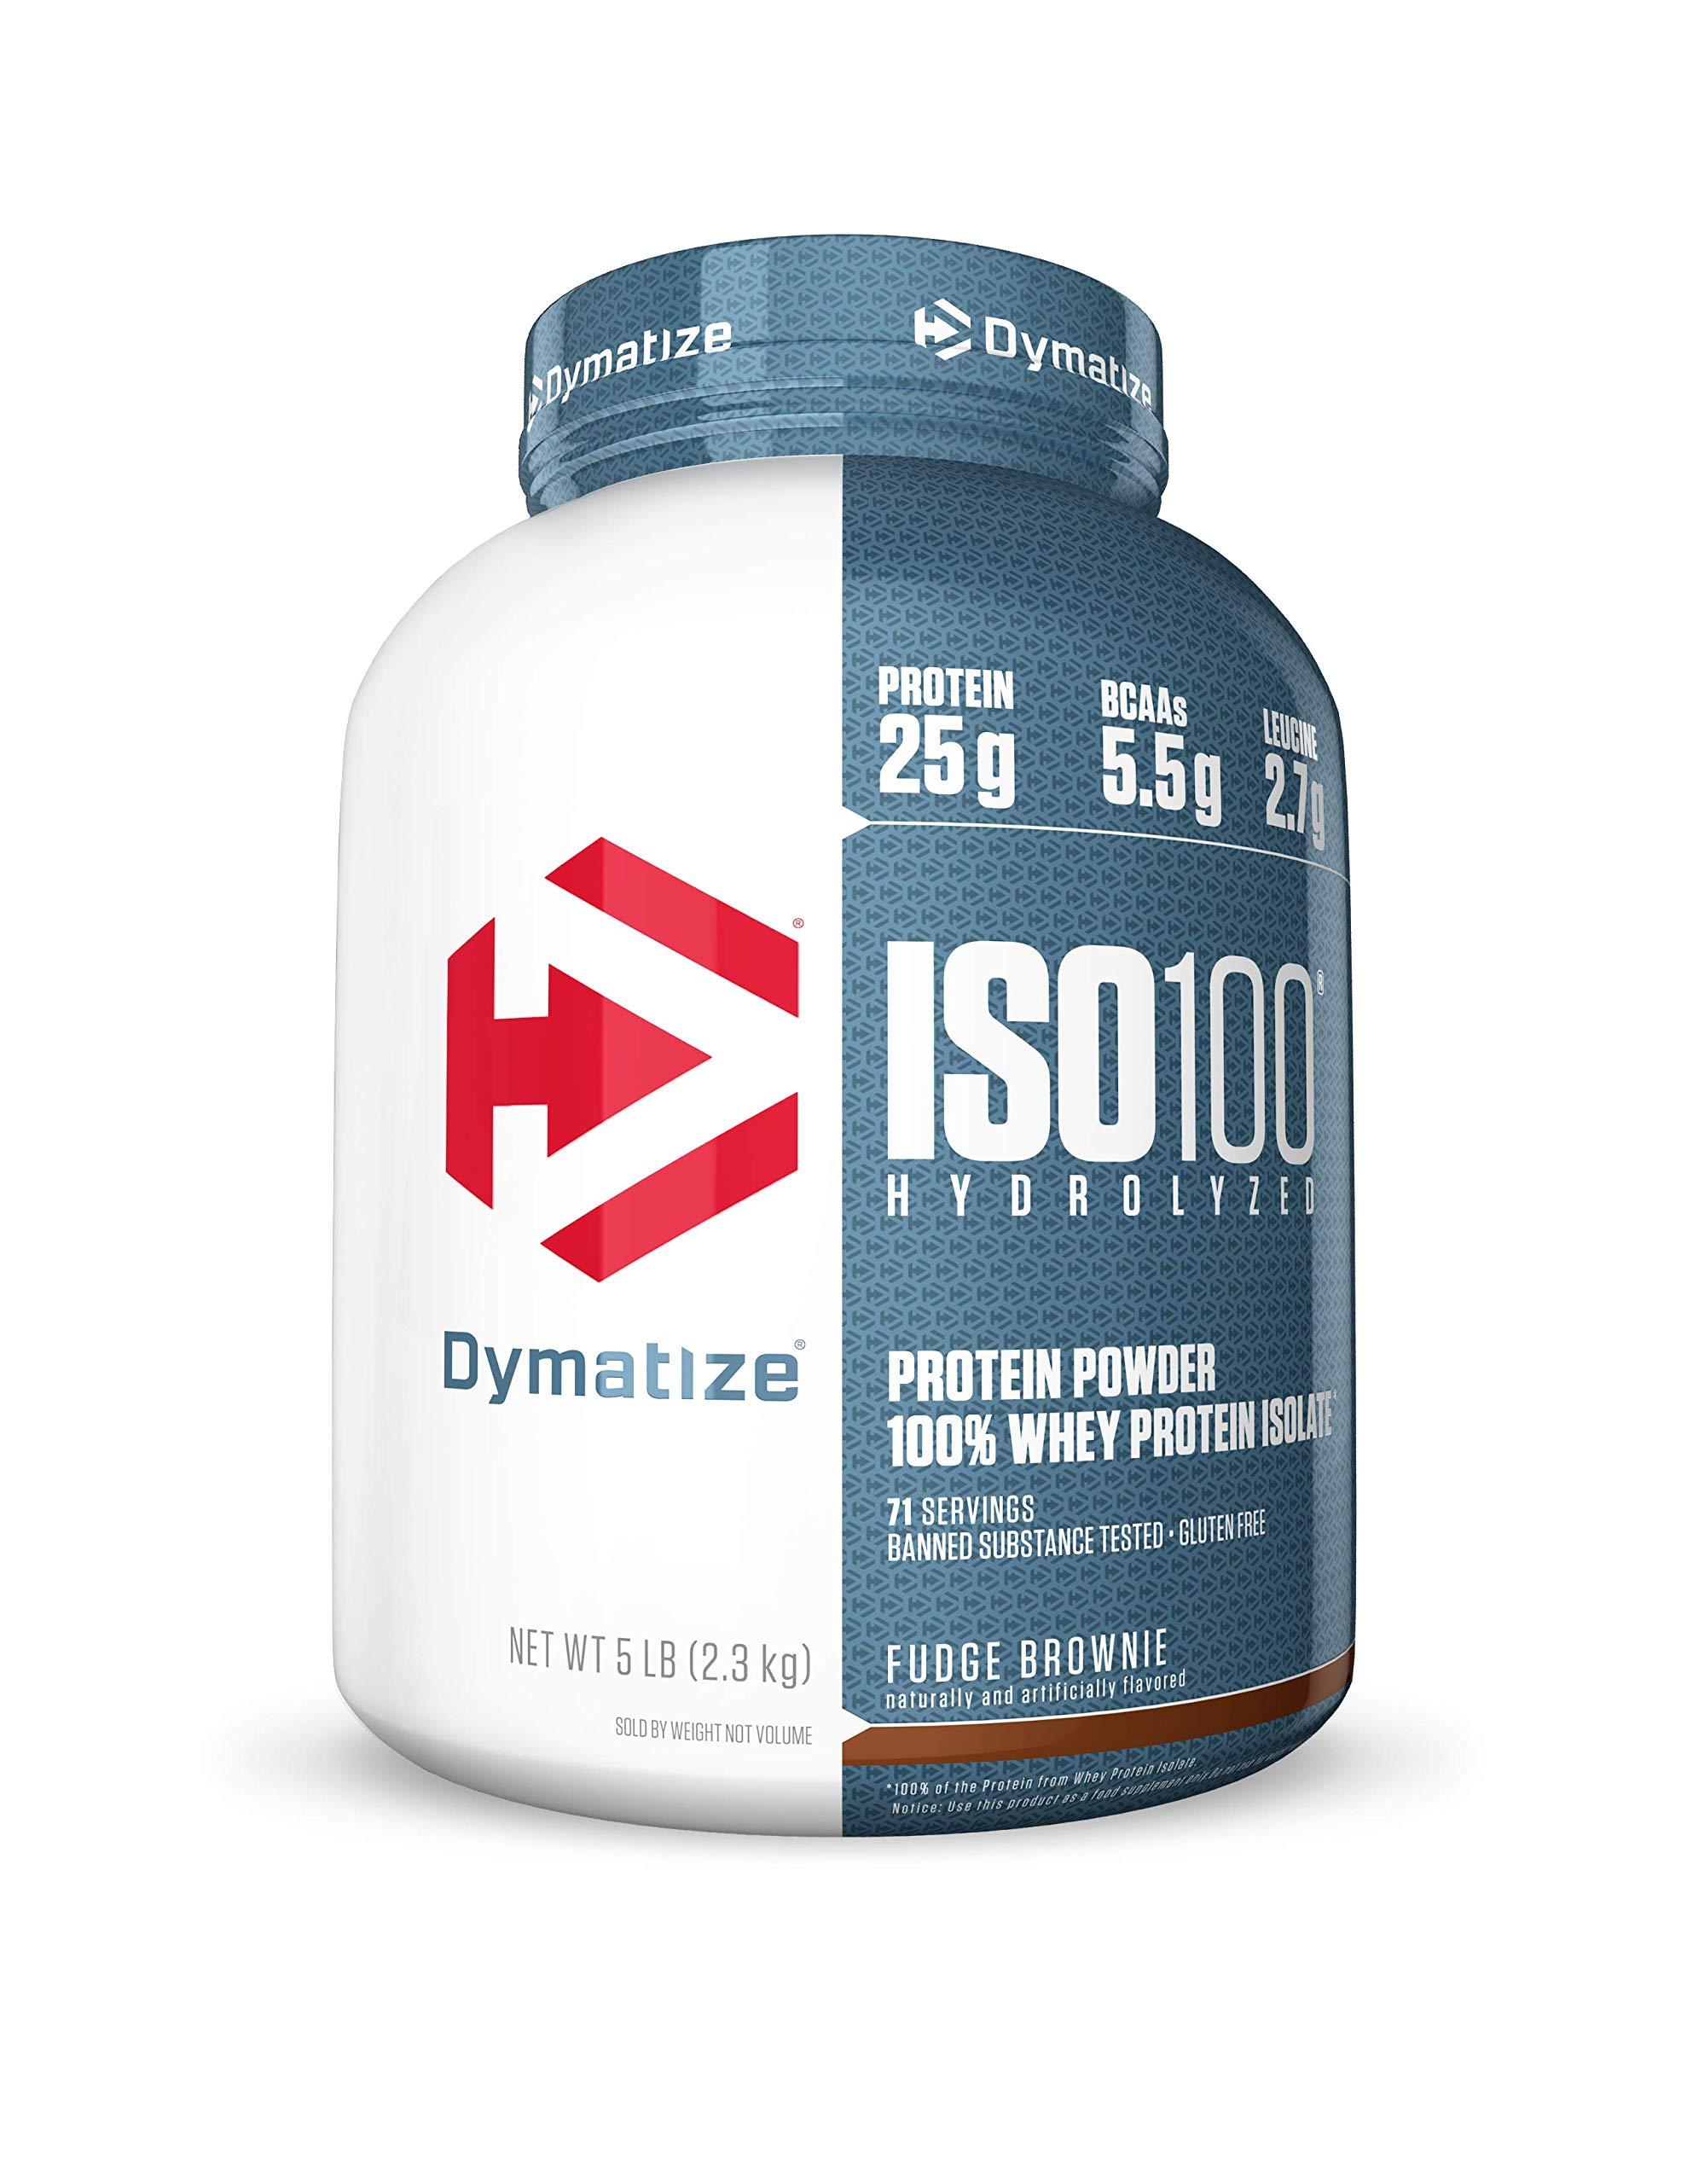 Dymatize ISO 100 Whey Protein Powder with 25g of Hydrolyzed 100% Whey Isolate, Gluten Free, Fast Digesting, Fudge Brownie, 5 Pound by Dymatize